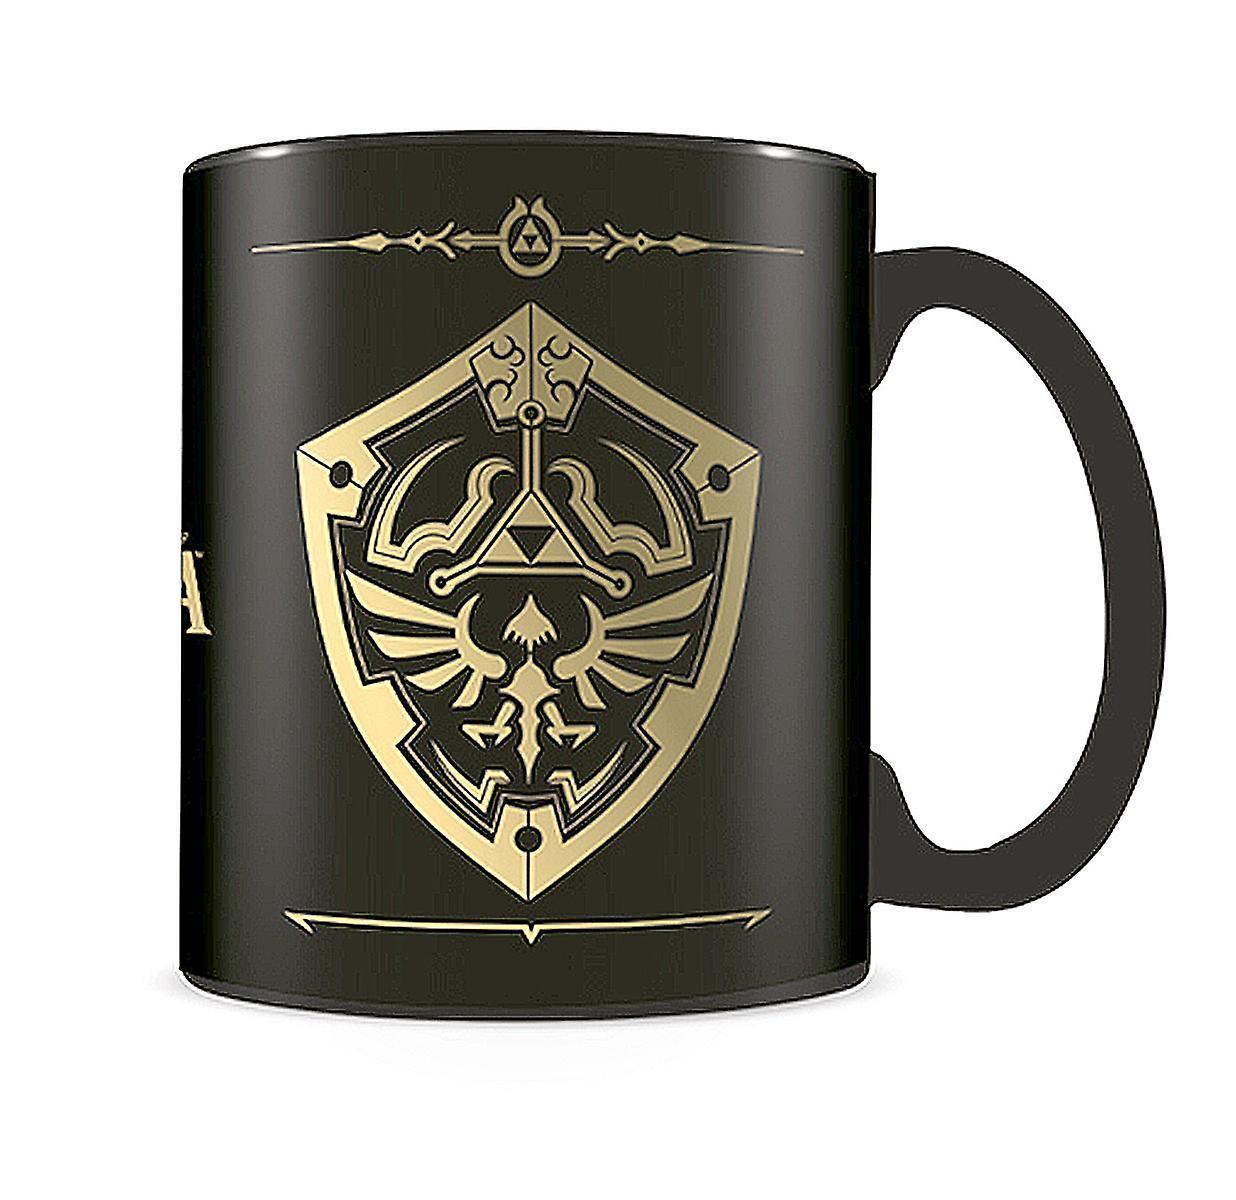 Nintendo - The Legend of Zelda : Foil Mug bouclier Hylian Shield